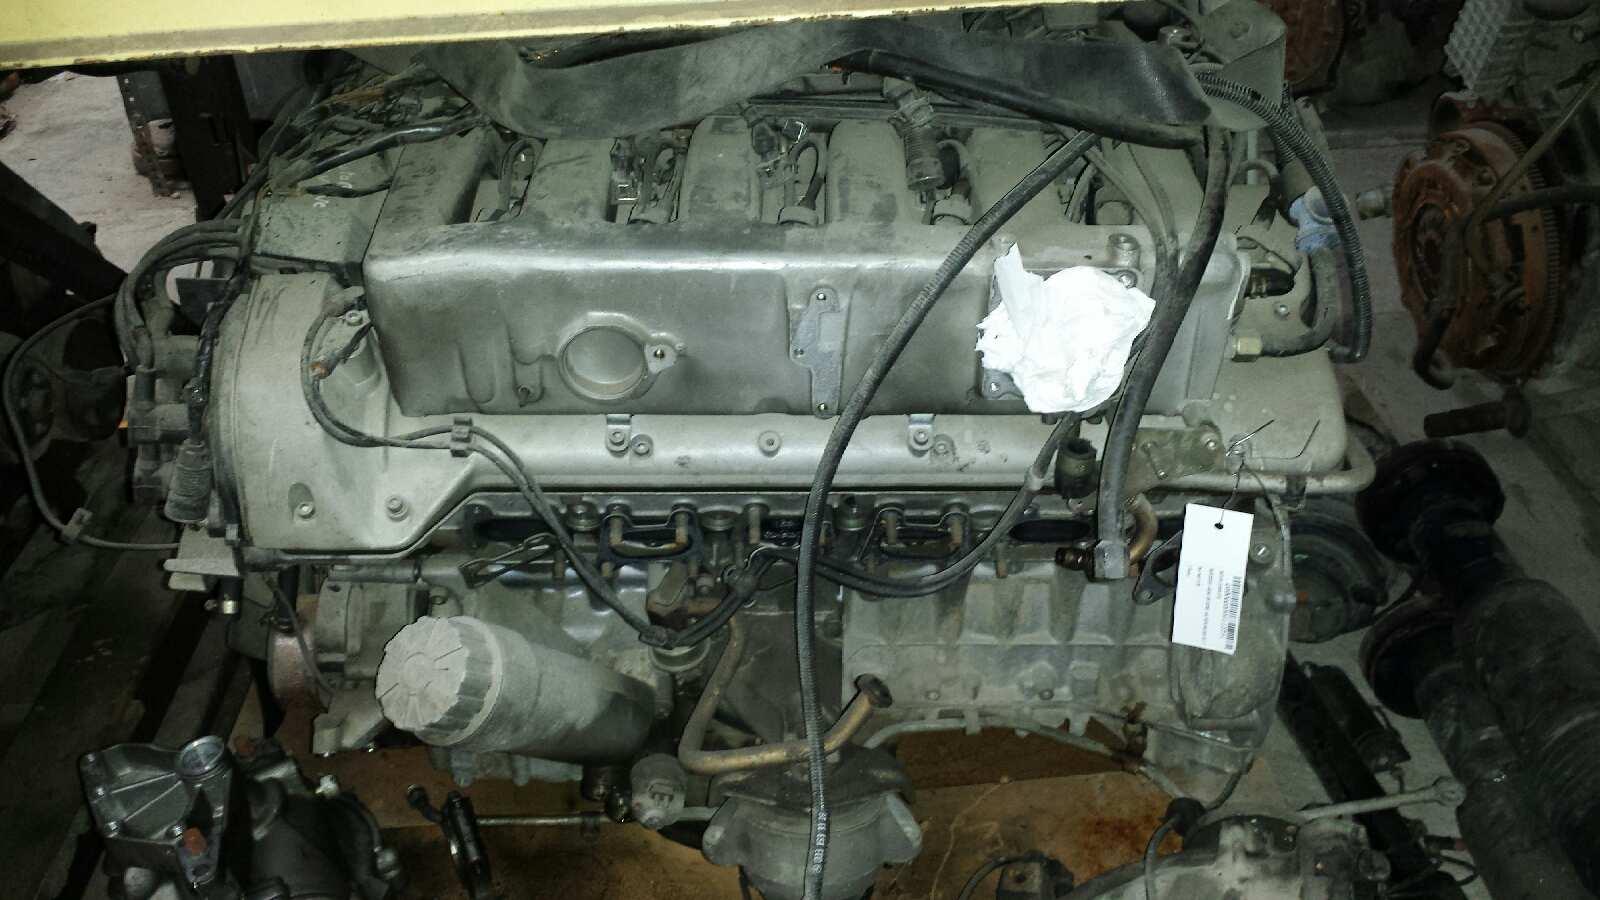 Motor completo de Mercedes benz Clase s (w140) berlina (1990 - 1998) G120